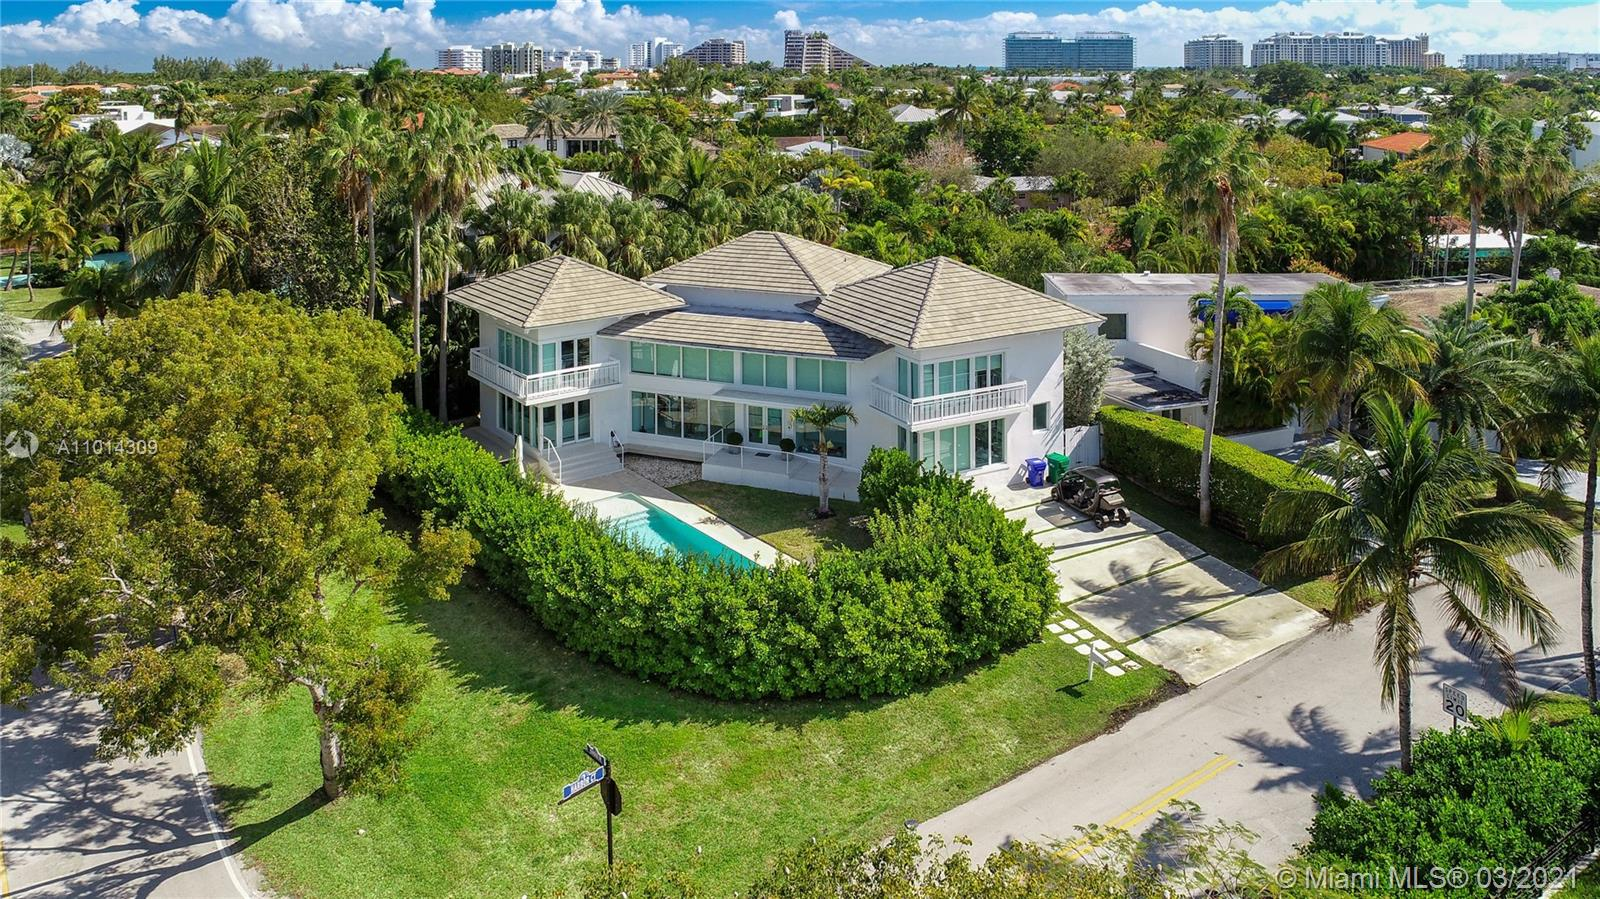 Tropical Isle Homes - 255 Harbor Dr, Key Biscayne, FL 33149